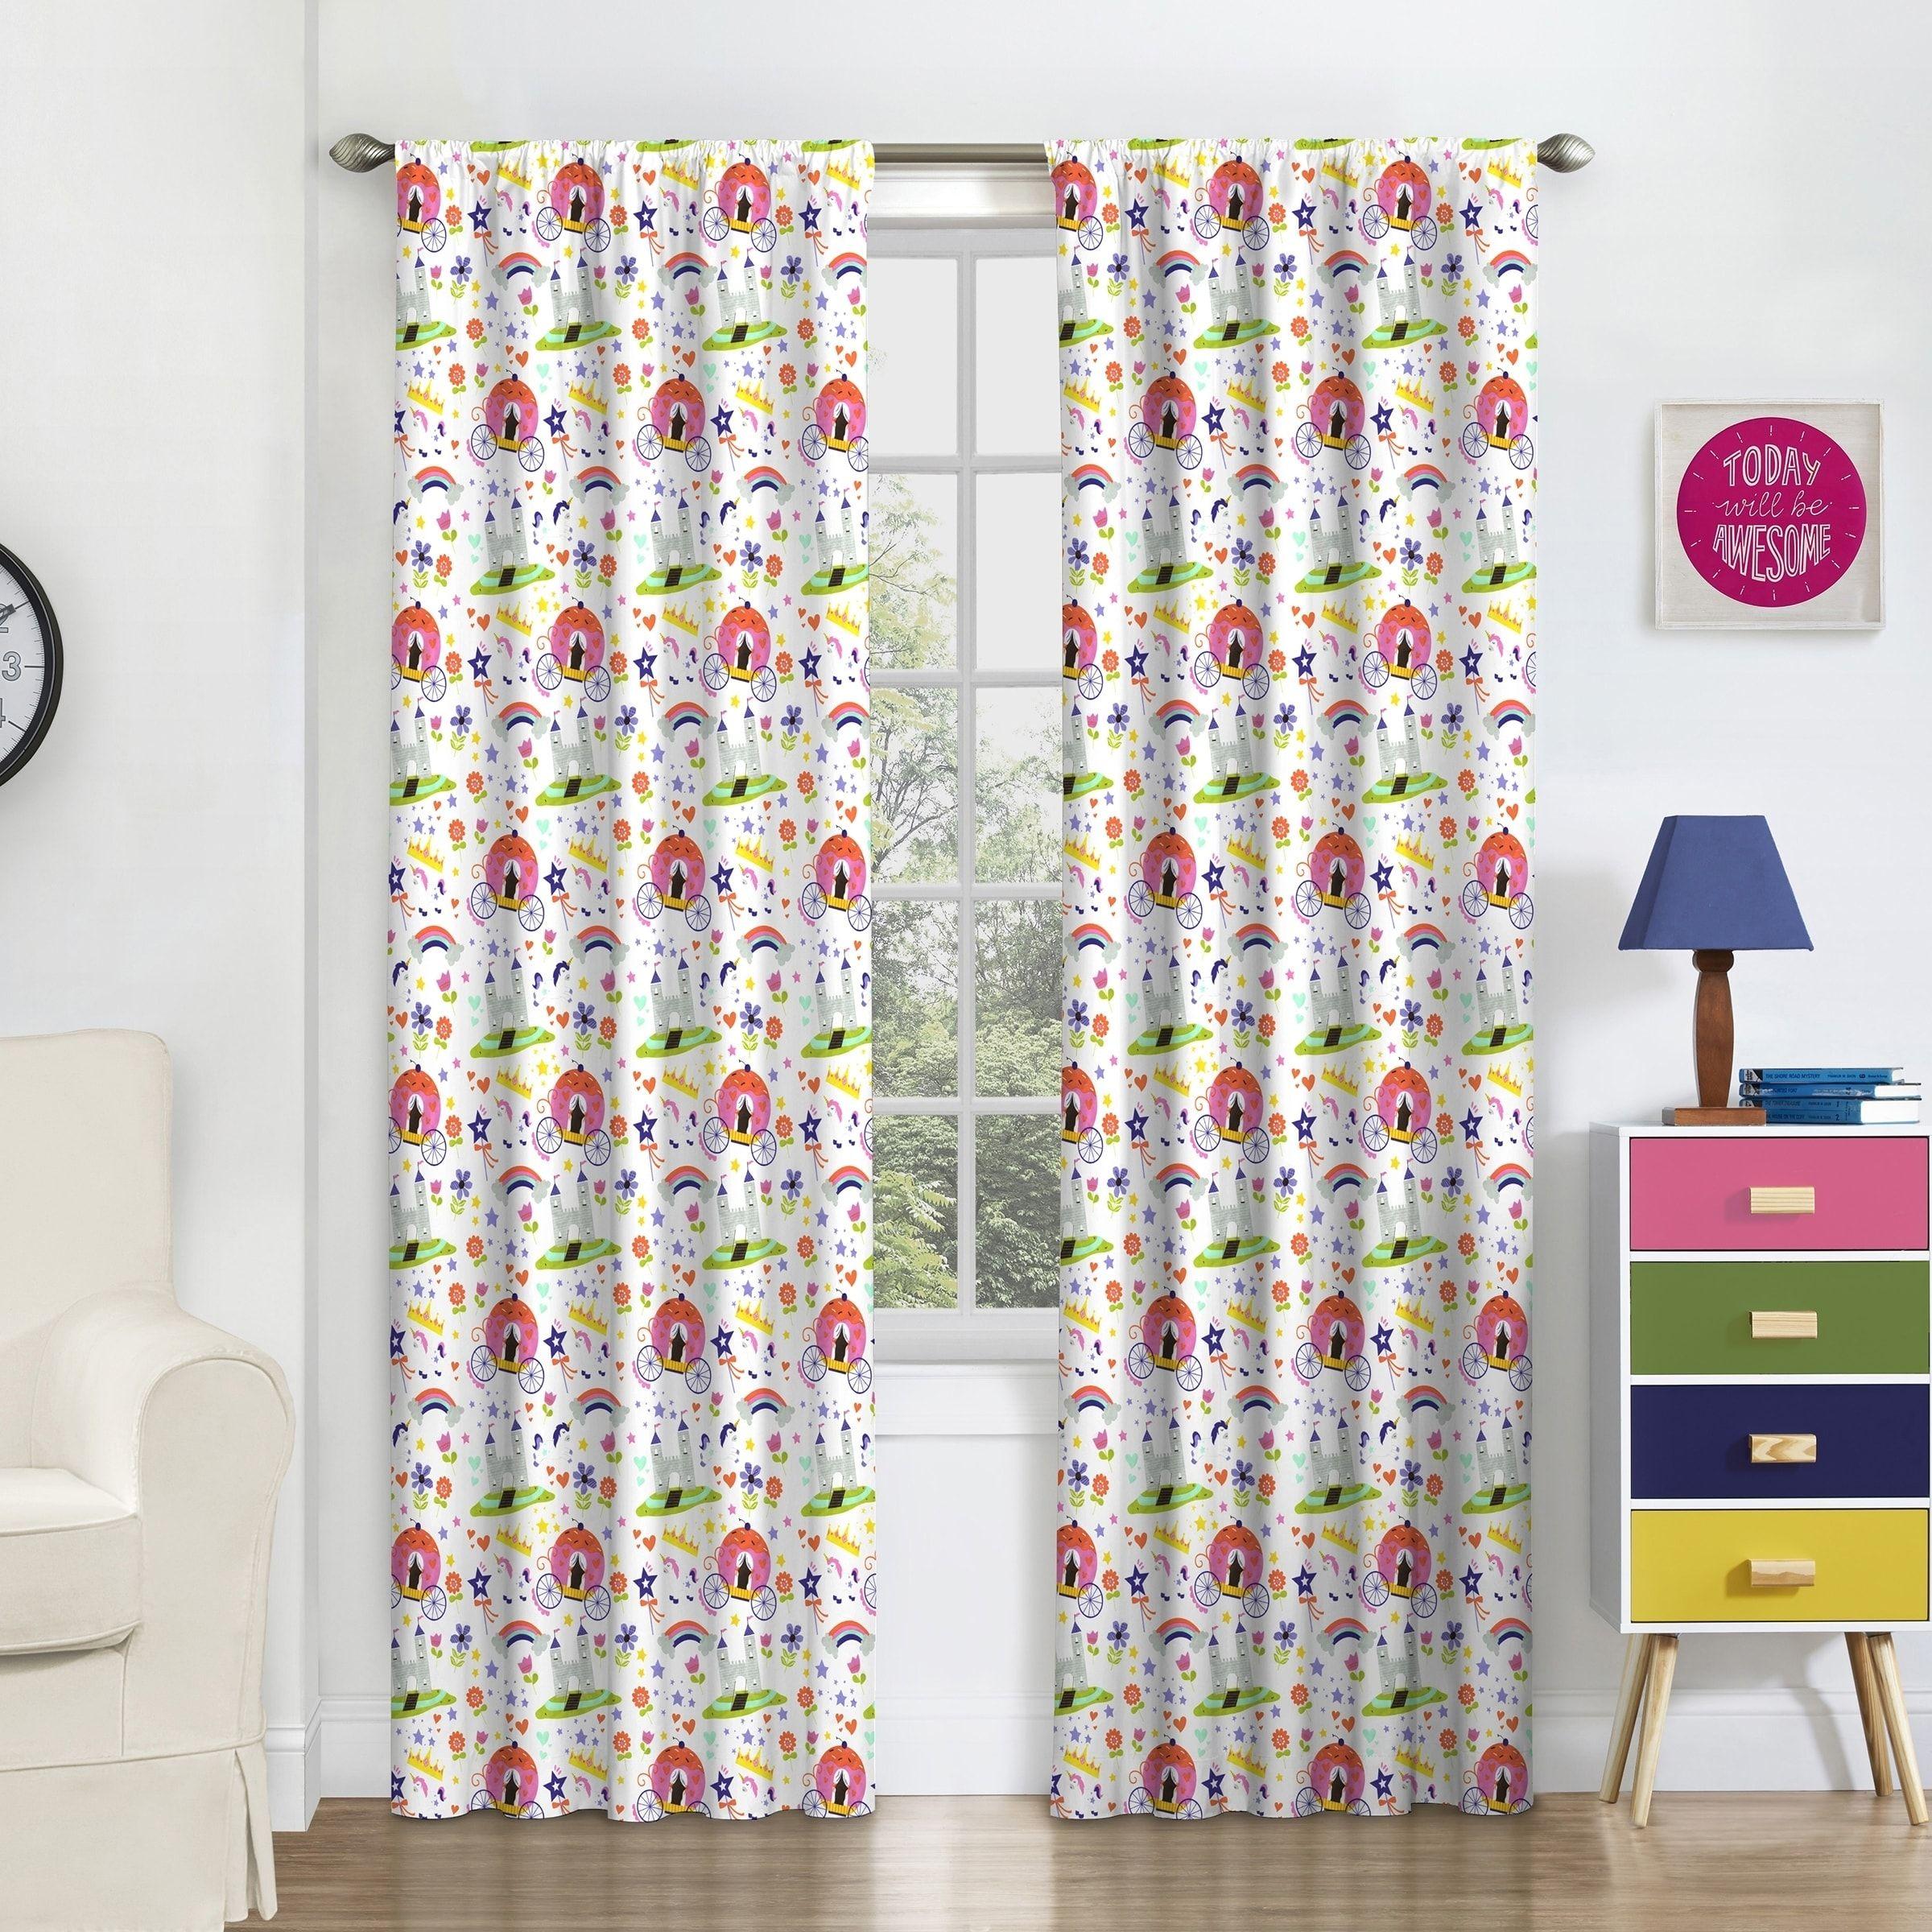 Eclipse Kids Pretty Princess Blackout Window Curtain Panel (42X84